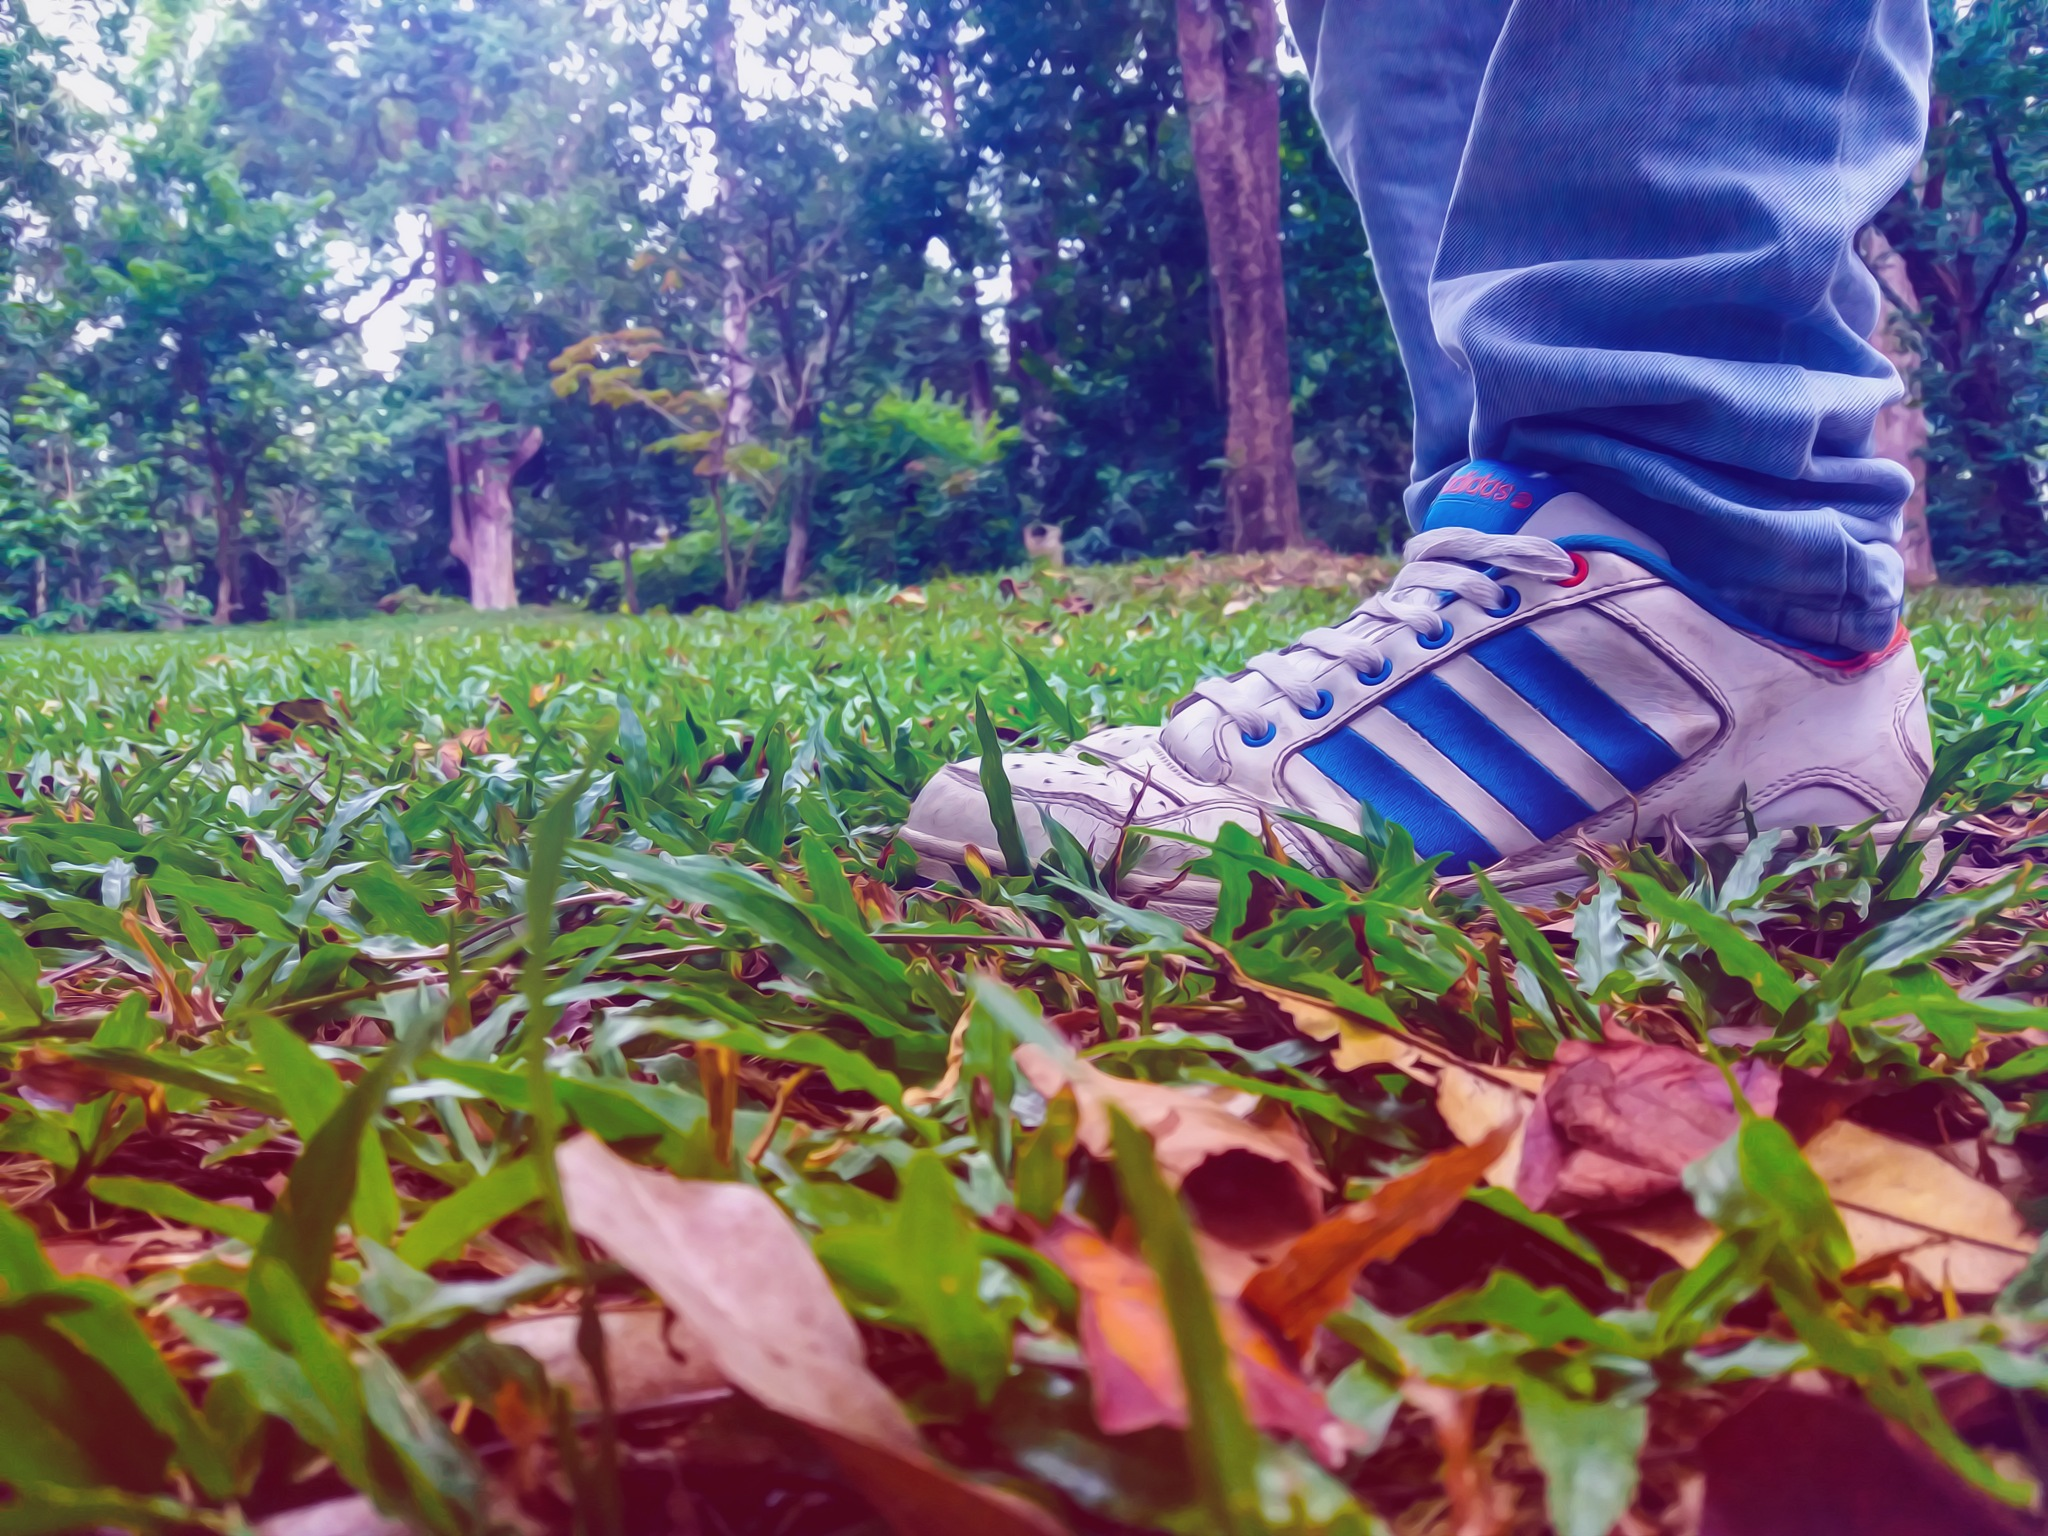 Shoe  by Ajay Priyadharshan